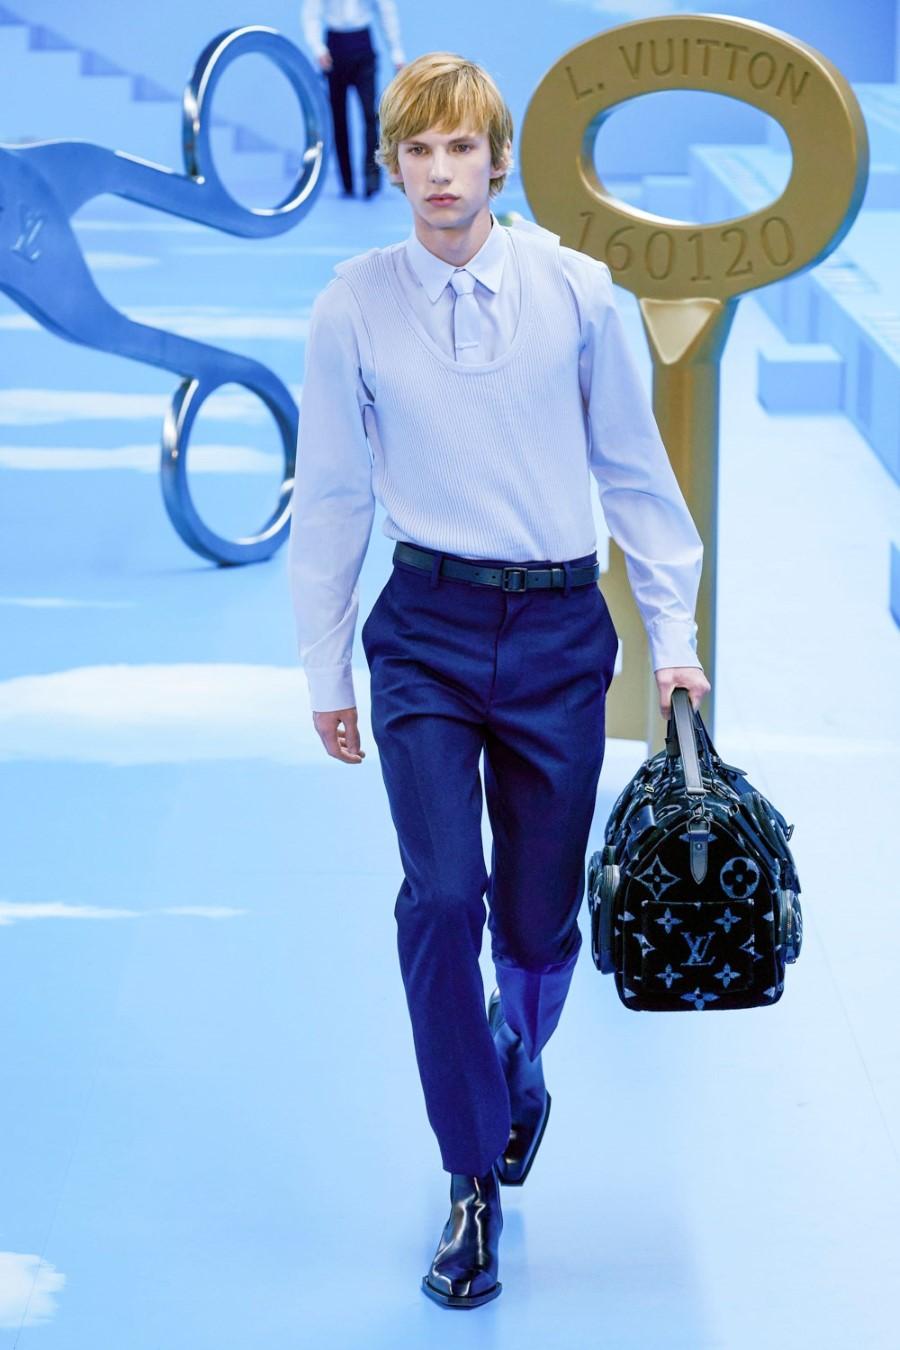 Louis Vuitton - Fall/Winter 2020 - Paris Fashion Week Men's